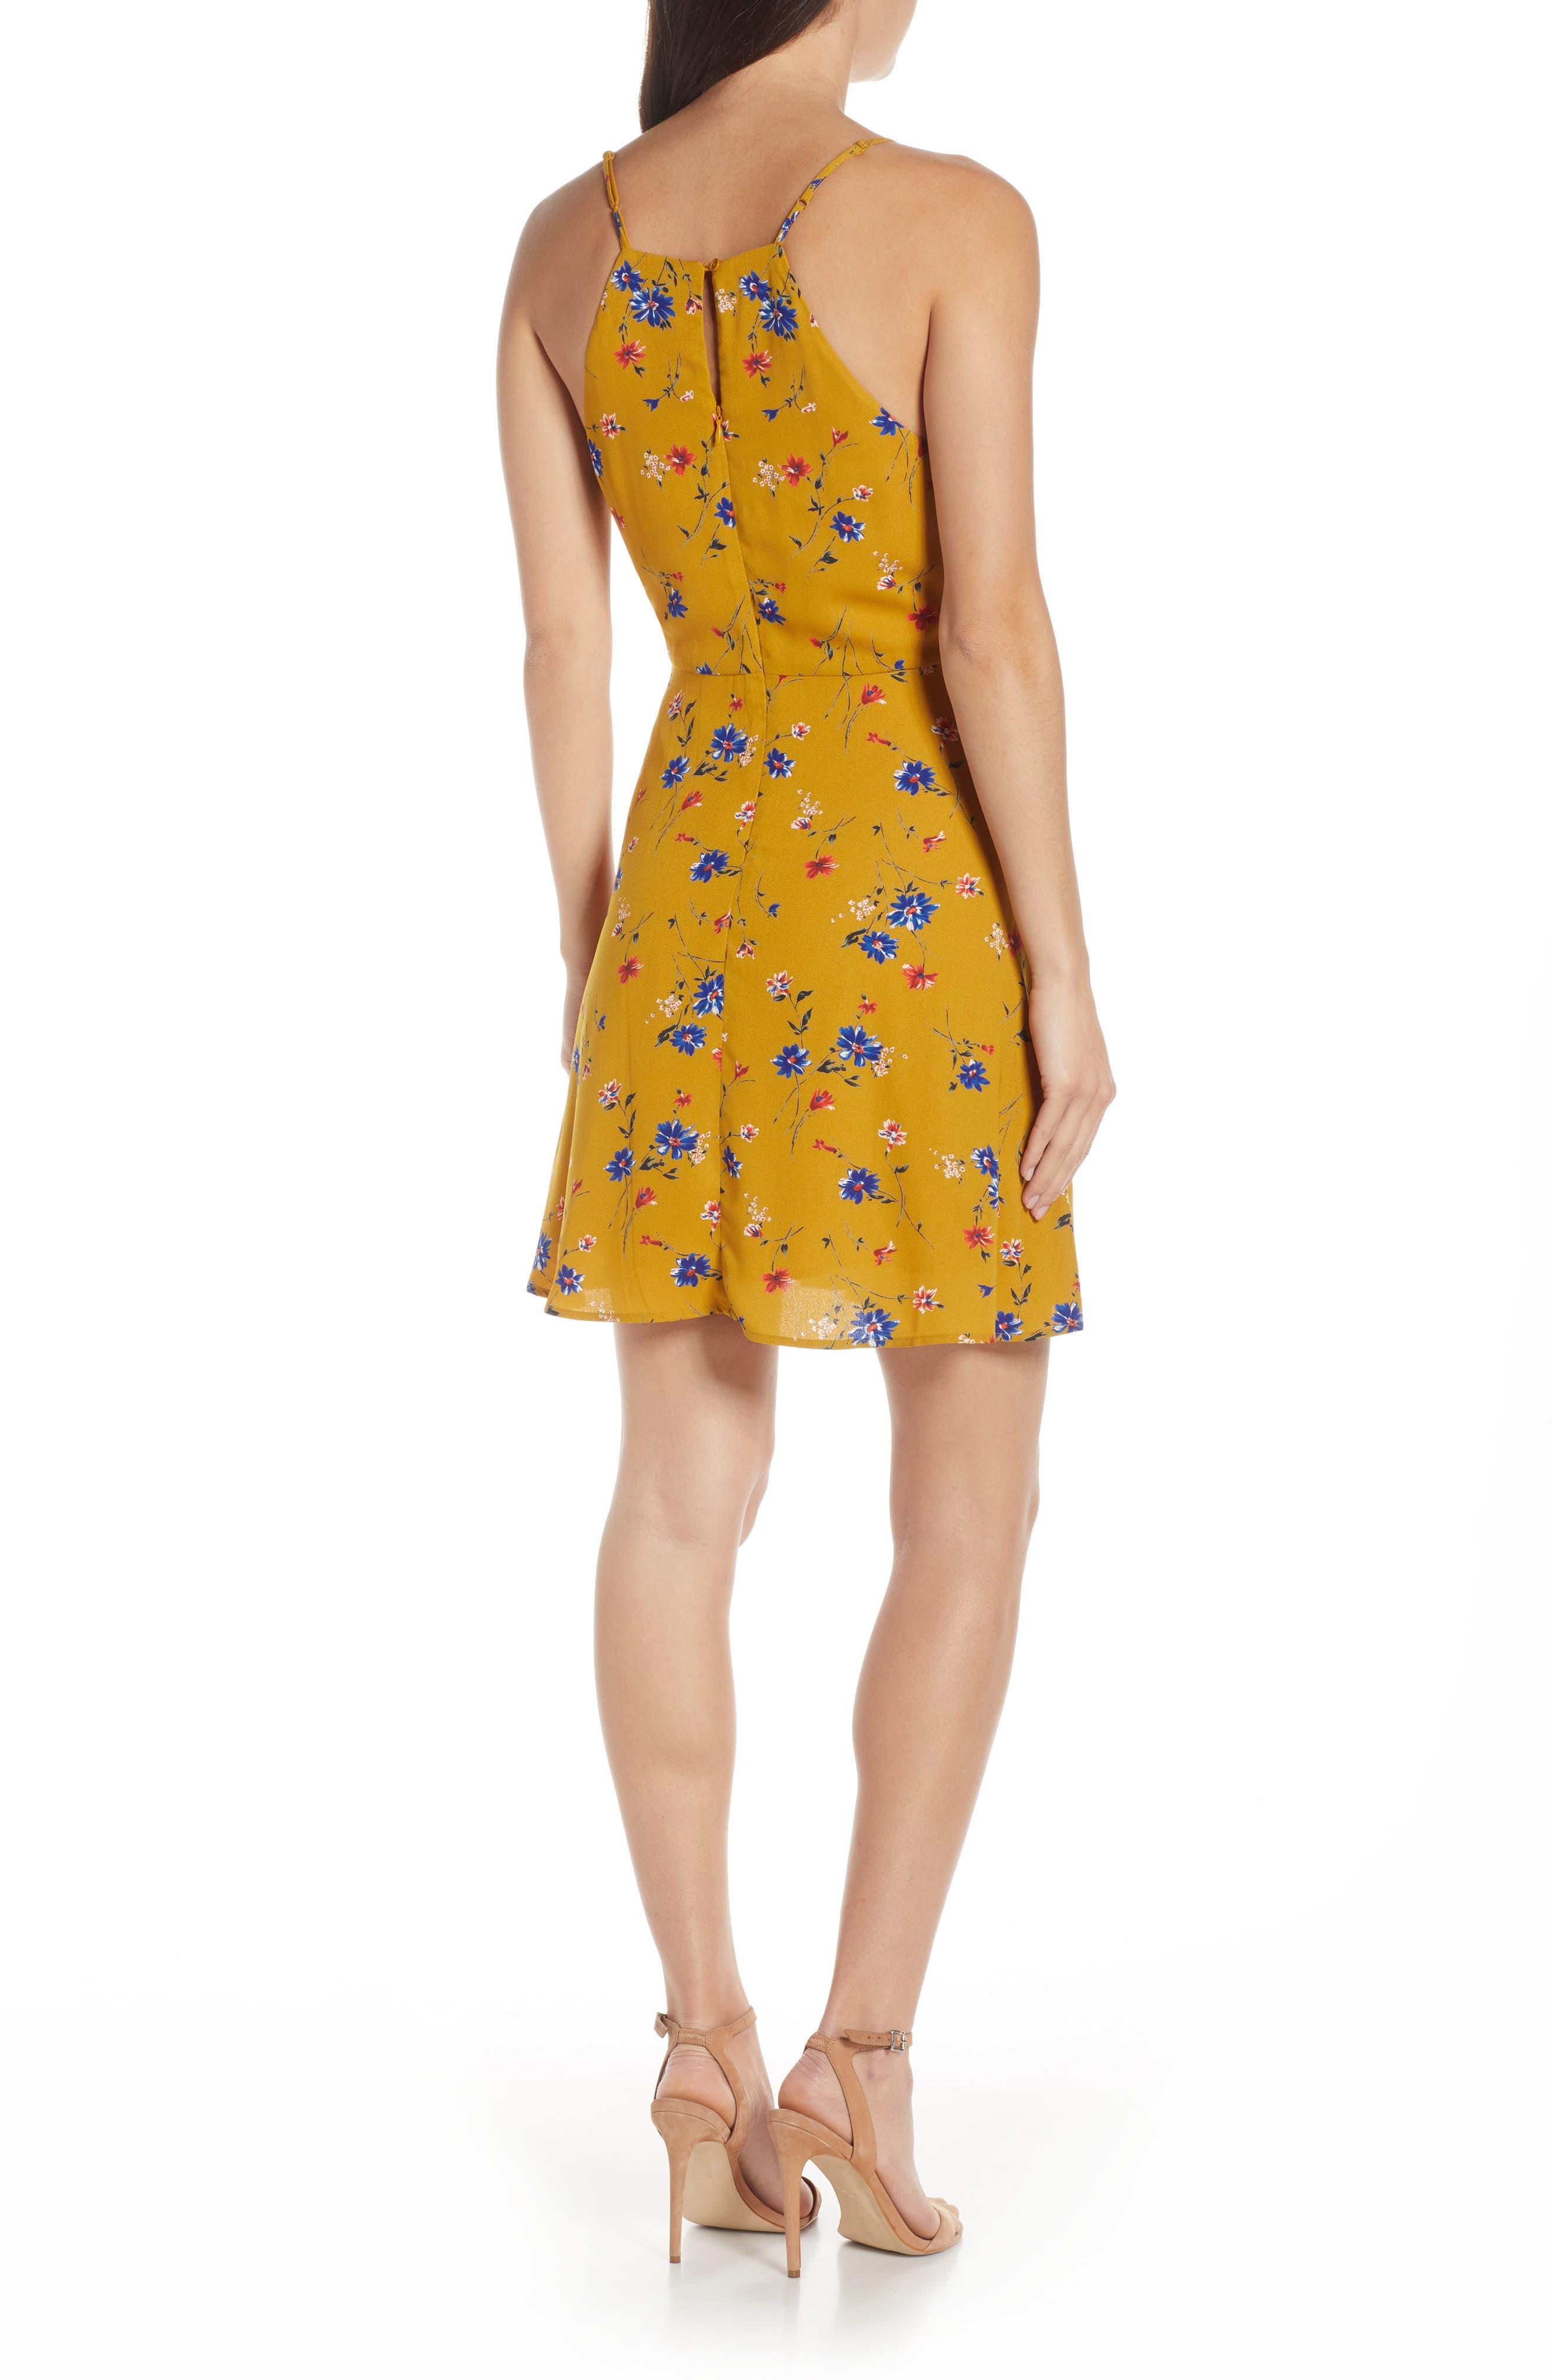 19 COOPER, Floral Print Tie Front Dress, Alternate thumbnail 2, color, MUSTARD FLORAL